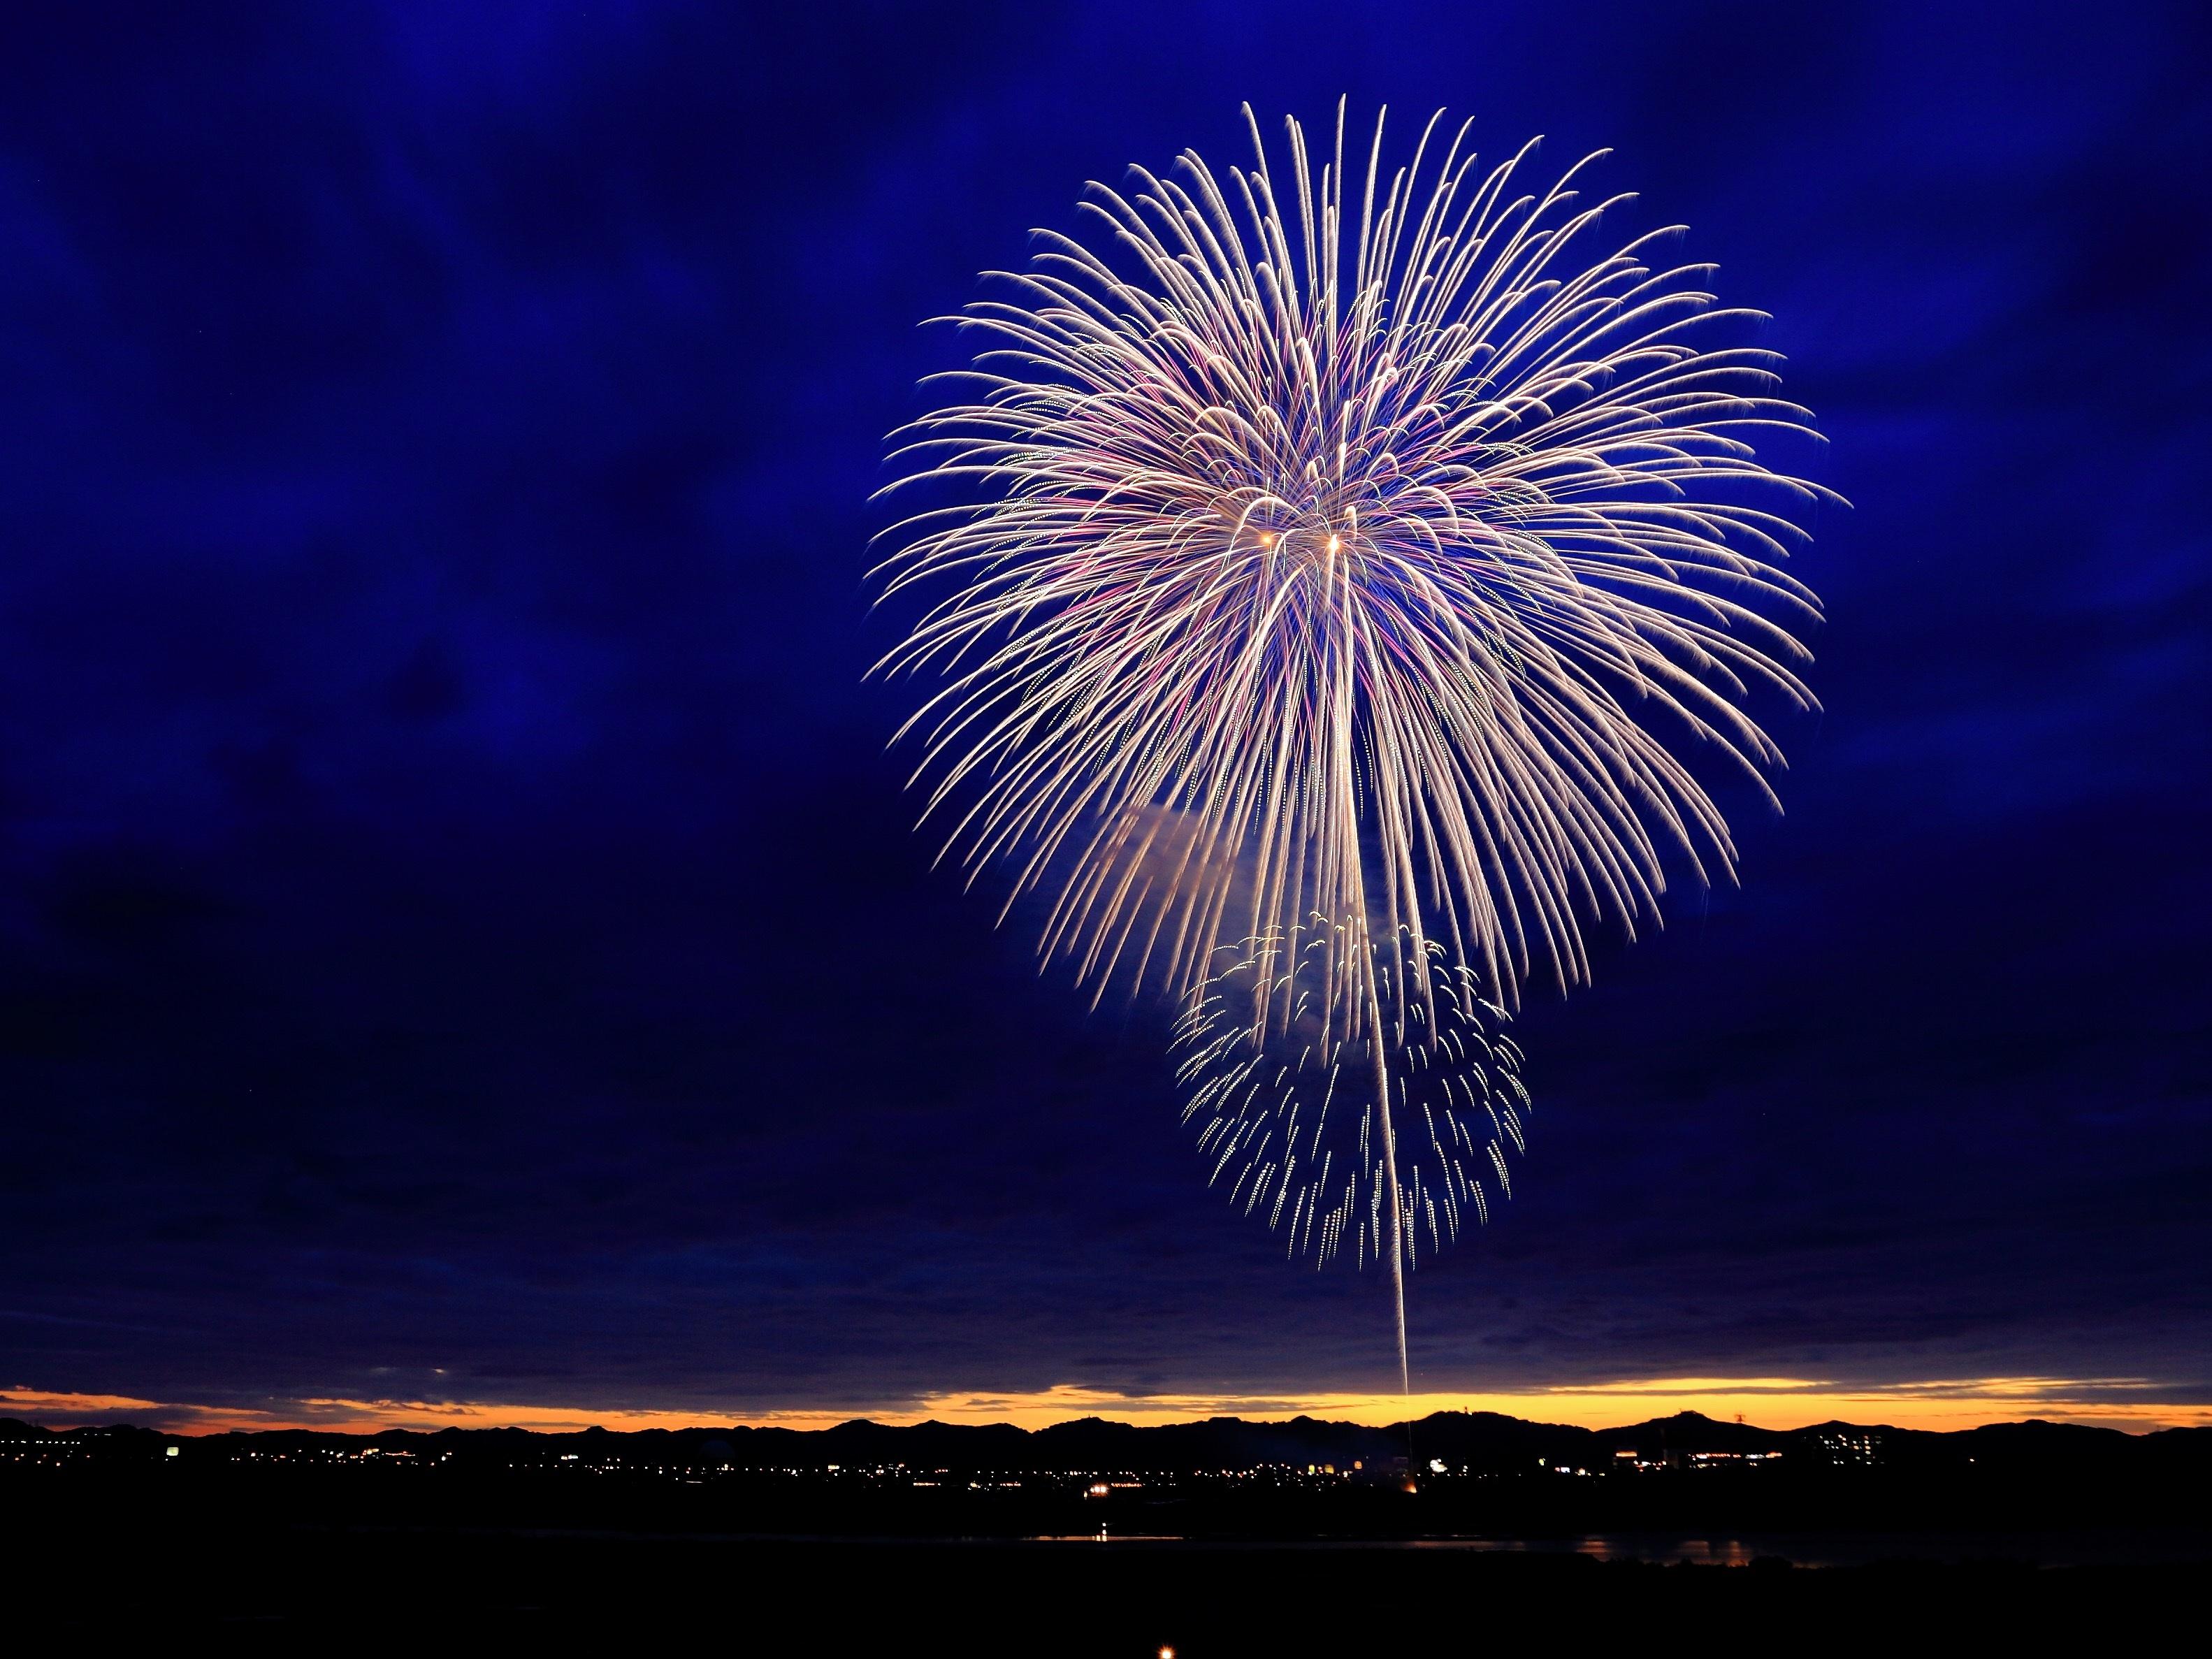 fireworks-on-dark-sky